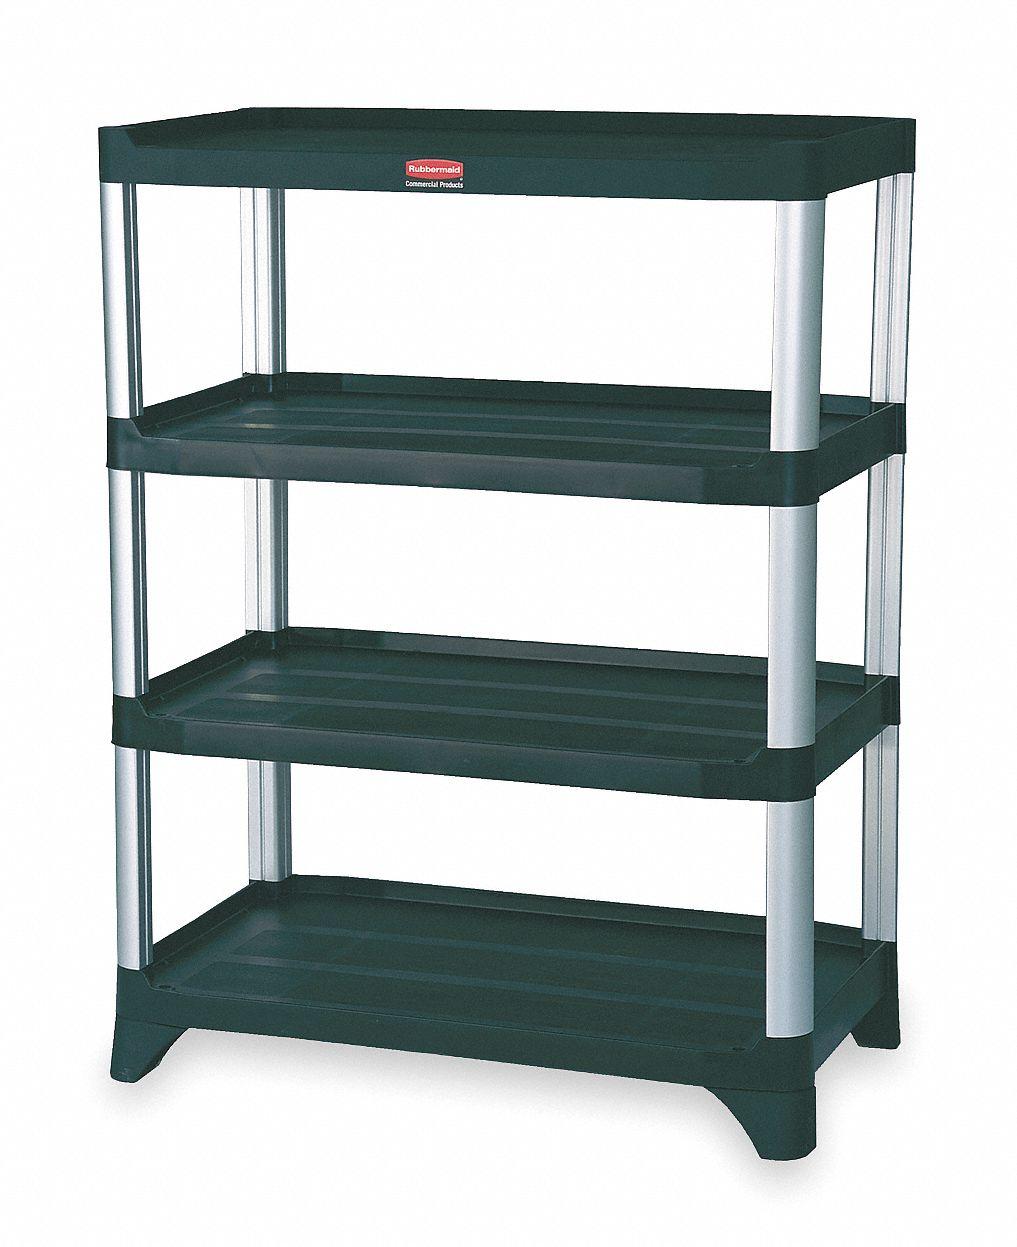 open freestanding plastic shelving overall width 20 in overall depth 35 in